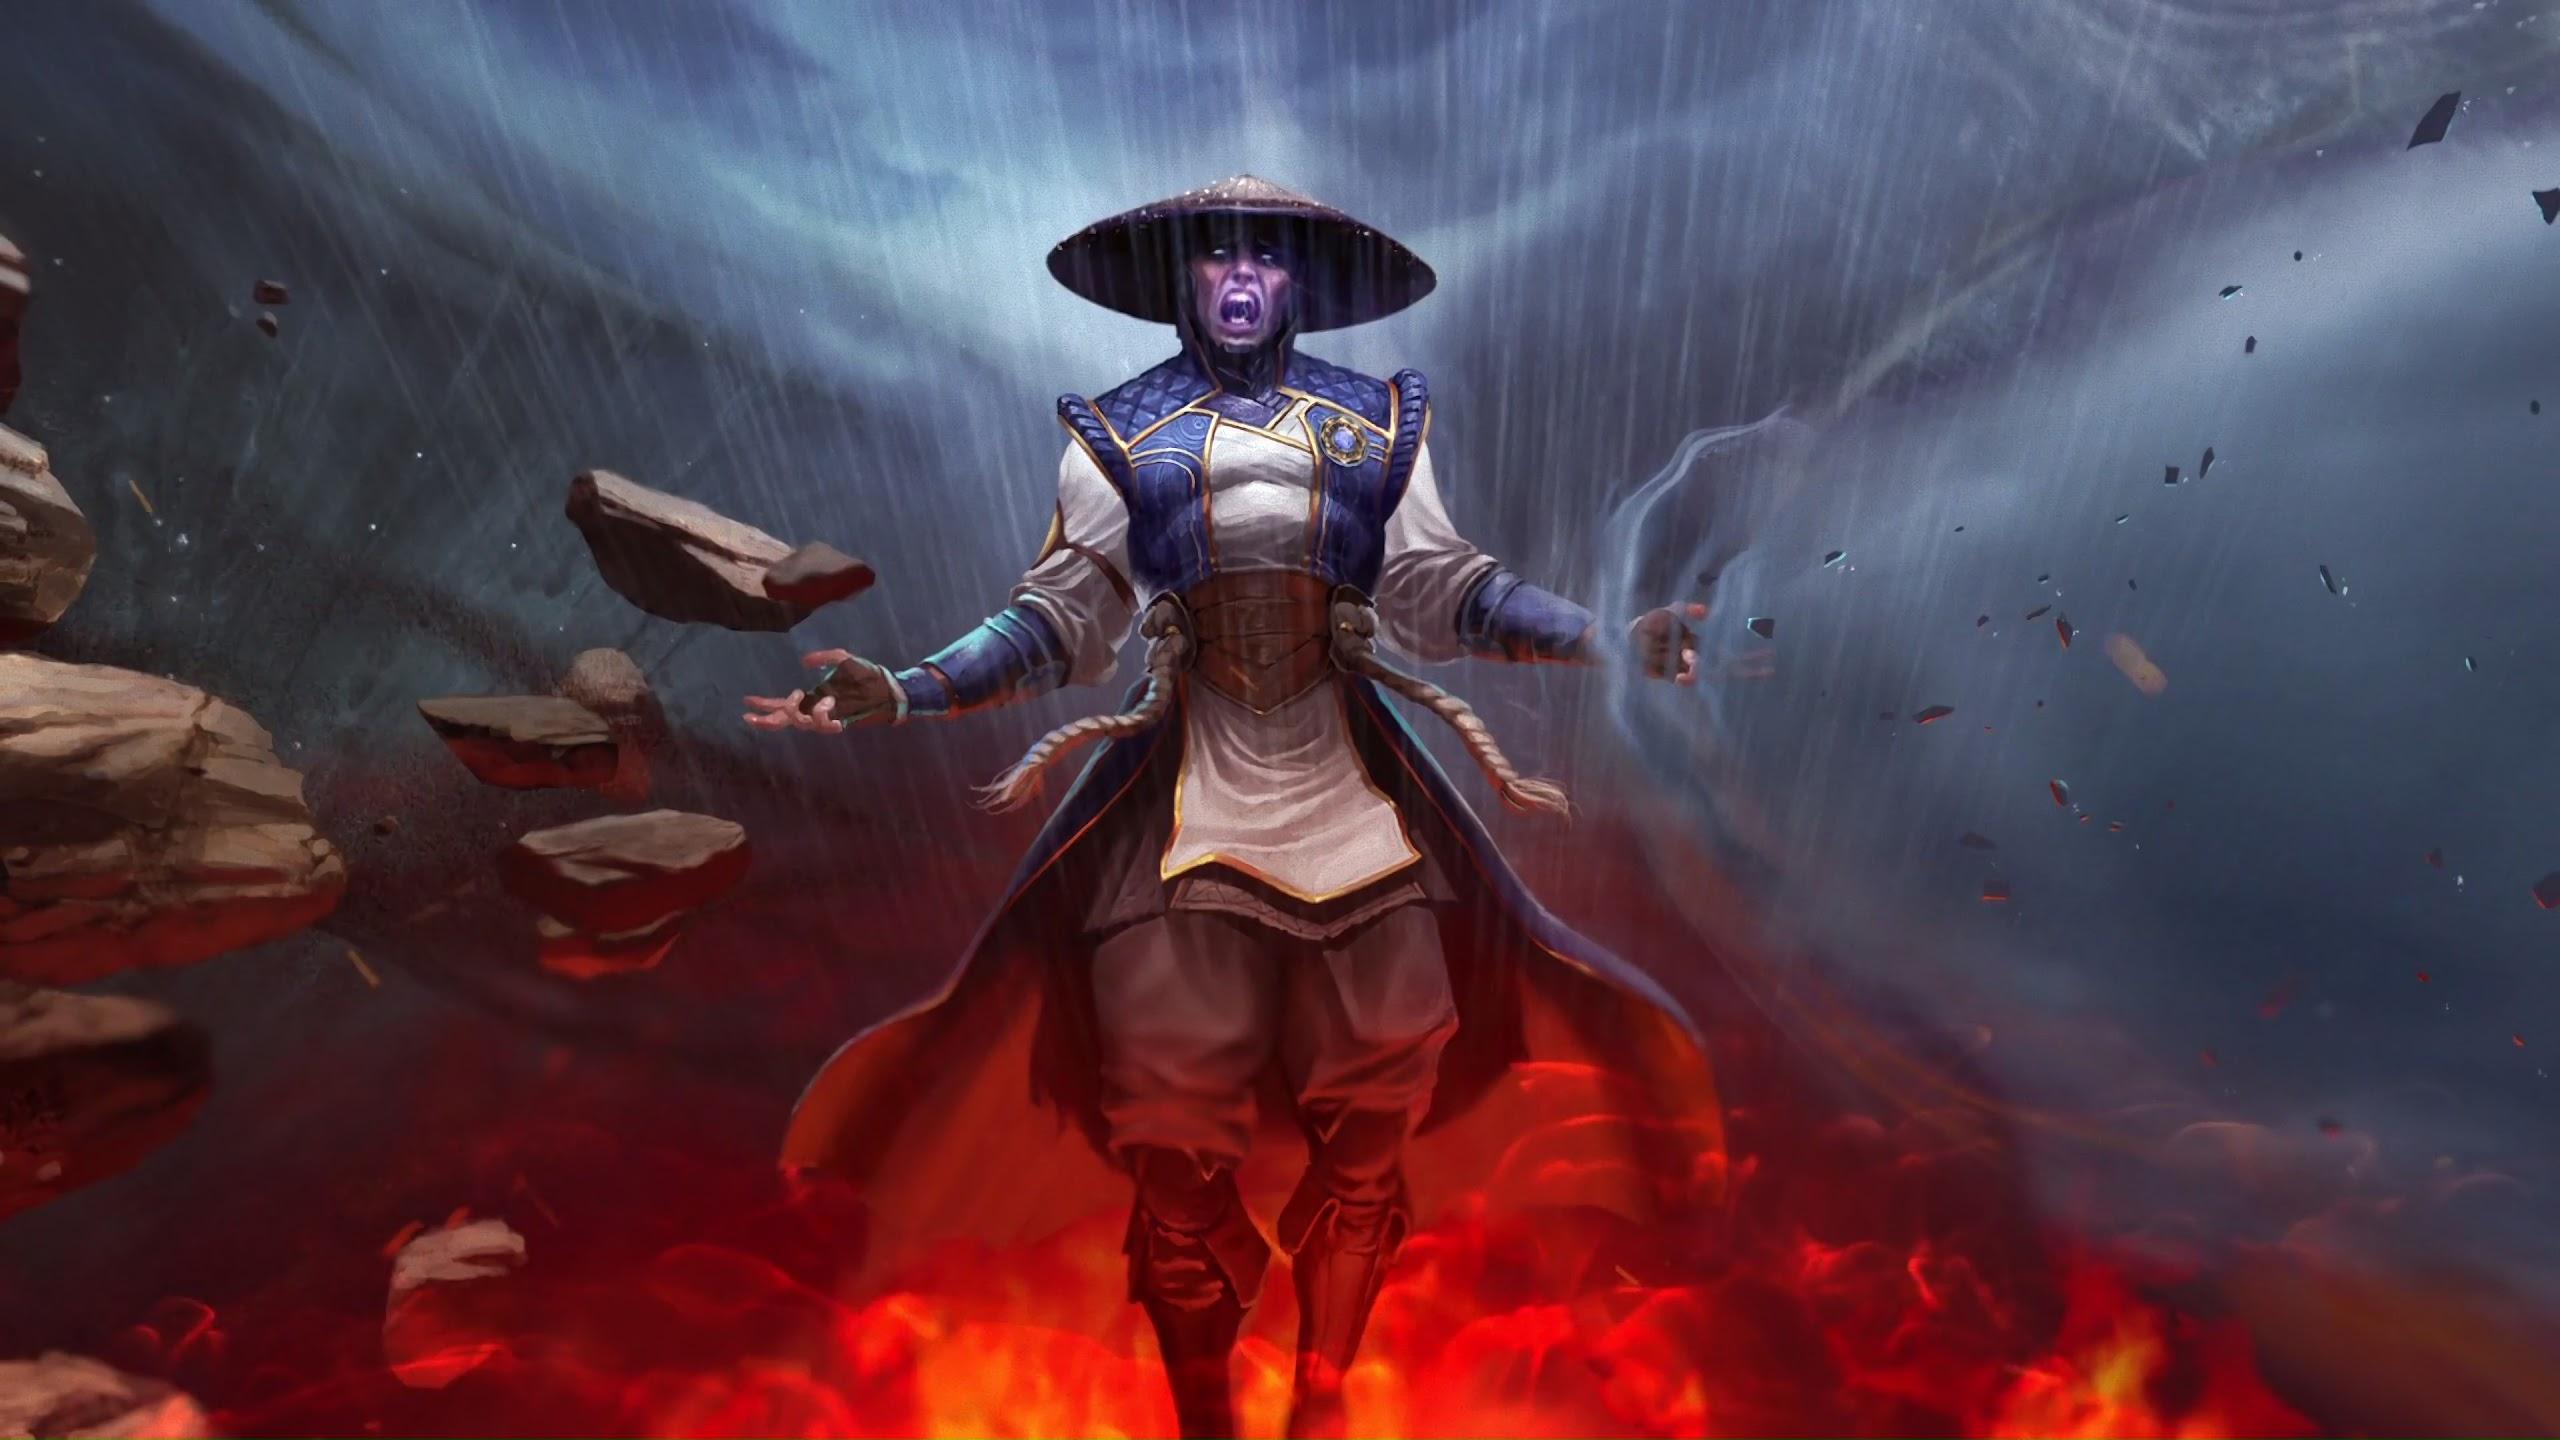 Raiden Mortal Kombat 11 4k Wallpaper 157